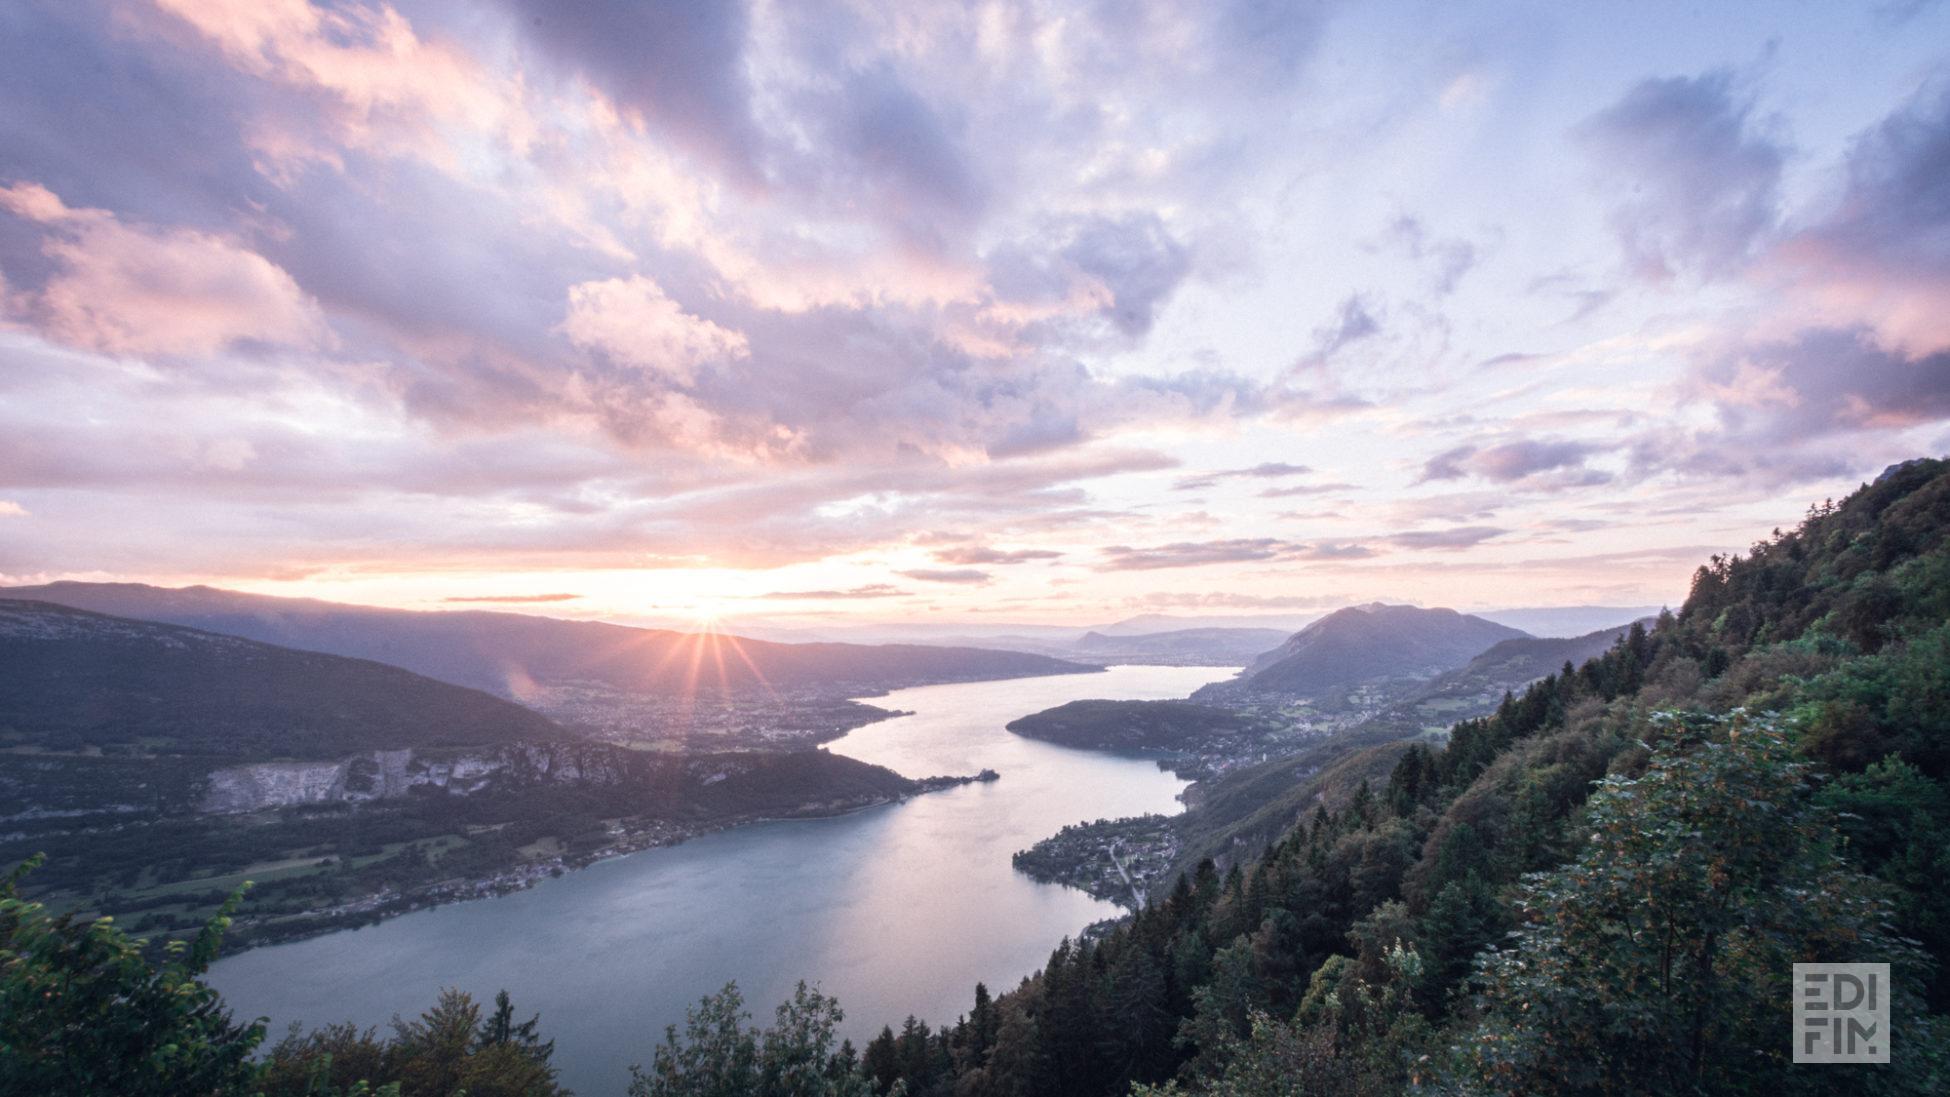 Le lac d'Annecy - Photo Anna Ivanova Photography